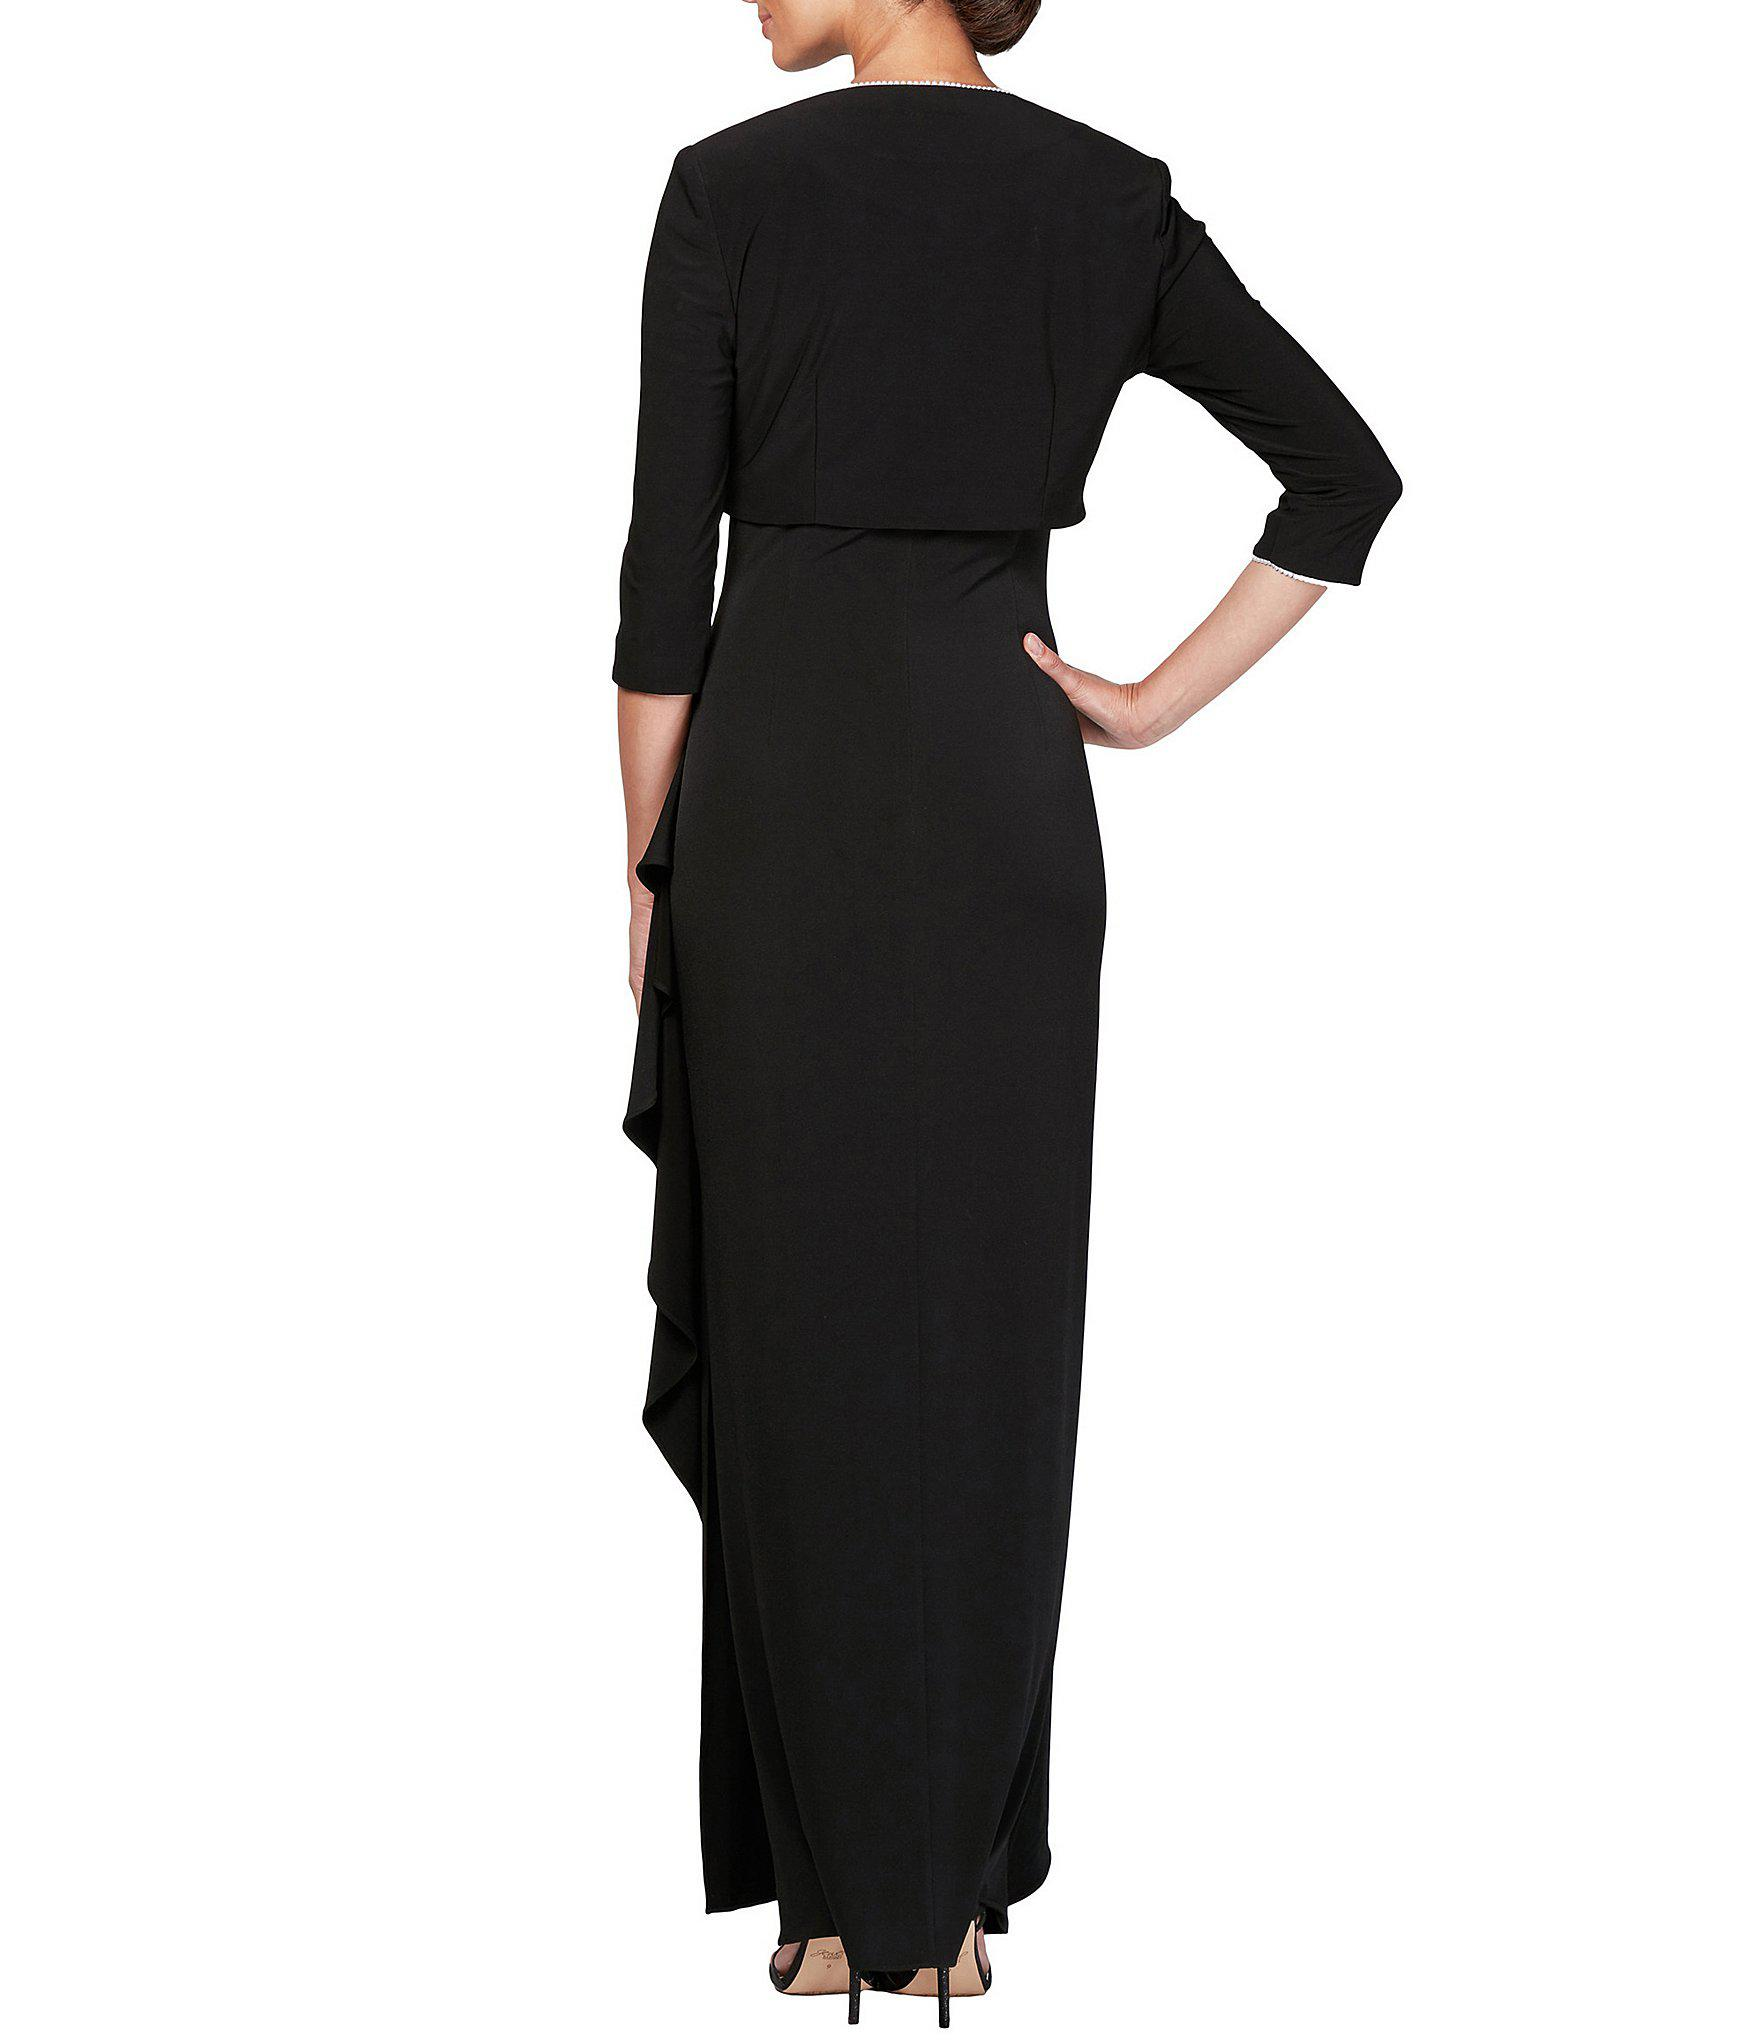 76230b732db Petite Evening Dresses Dillards - Gomes Weine AG